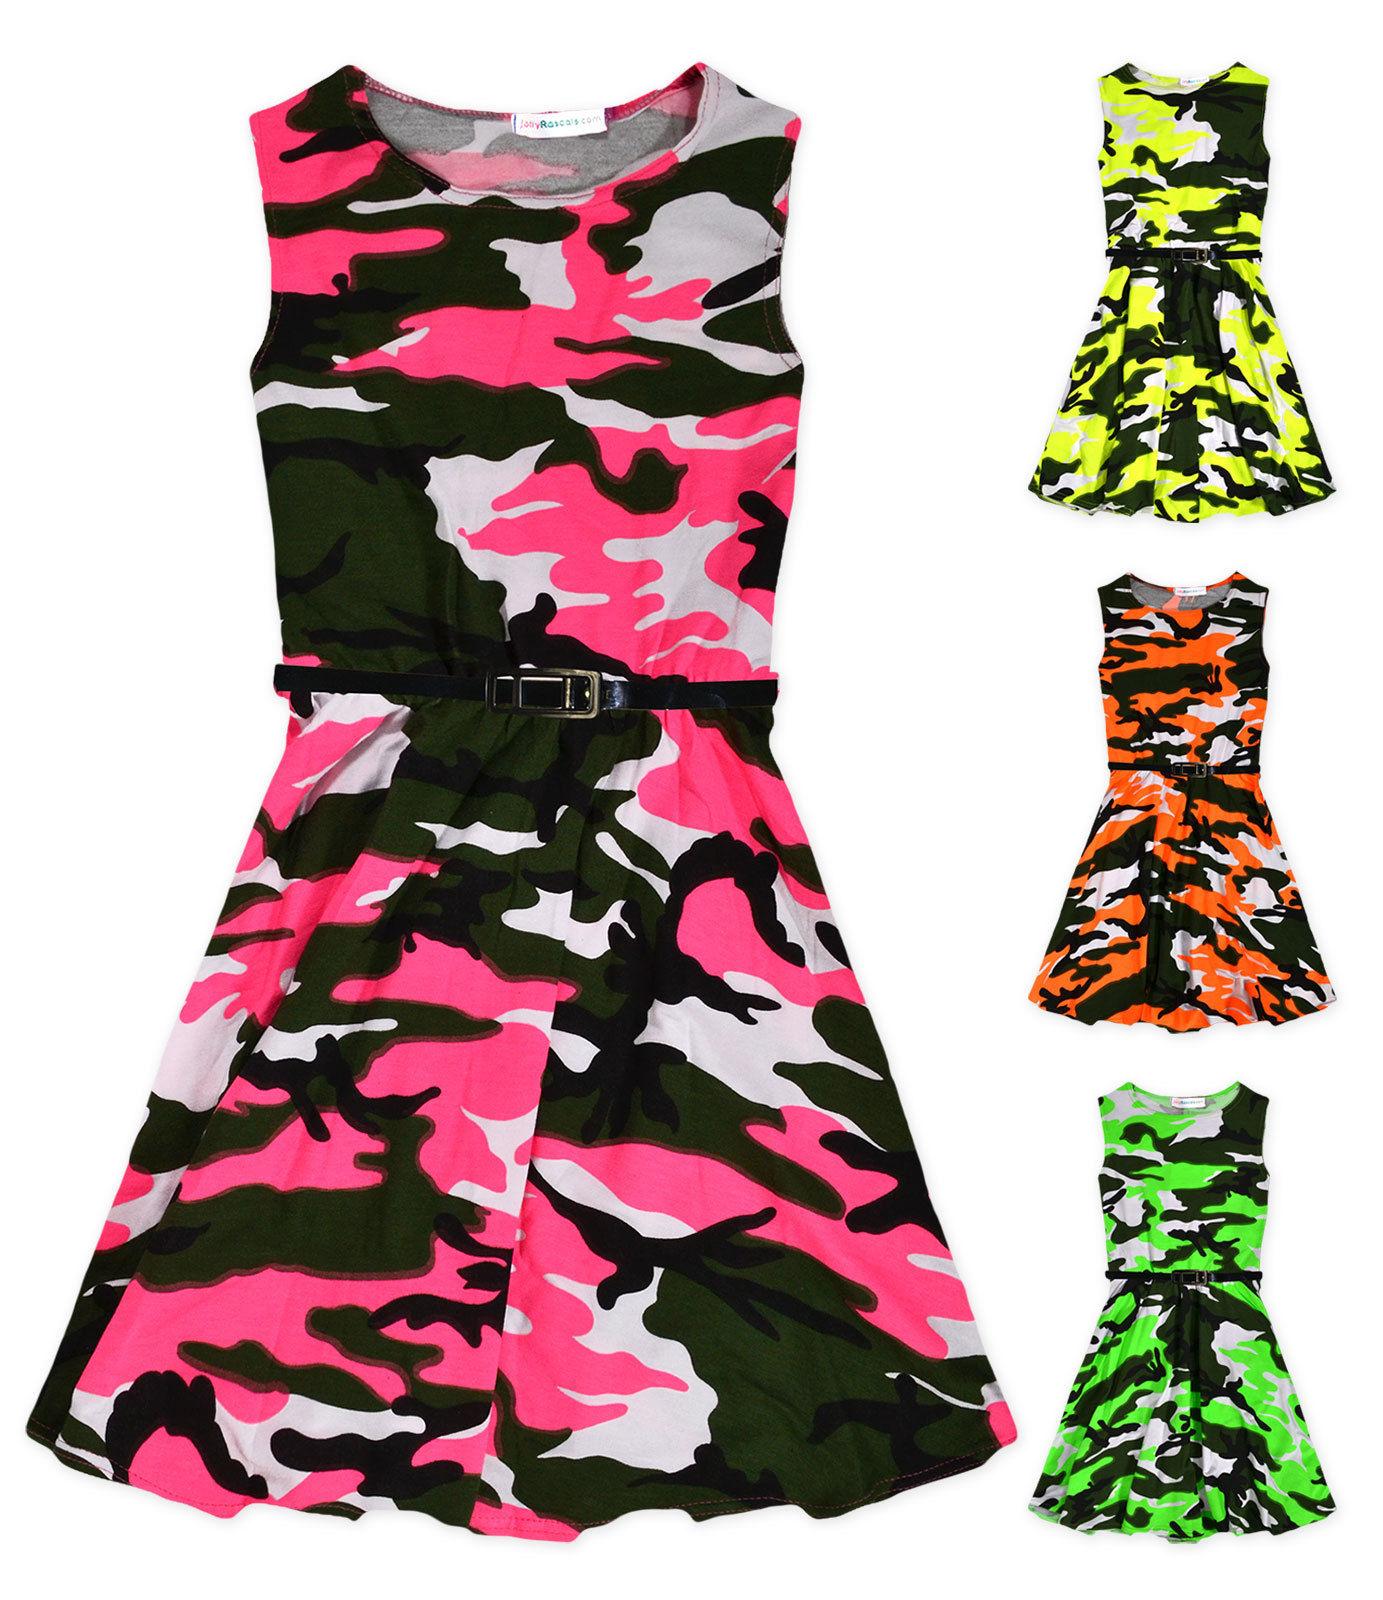 Girls Skater Dress Kids Neon Floral Print Summer Party Dresses 7-13 Years